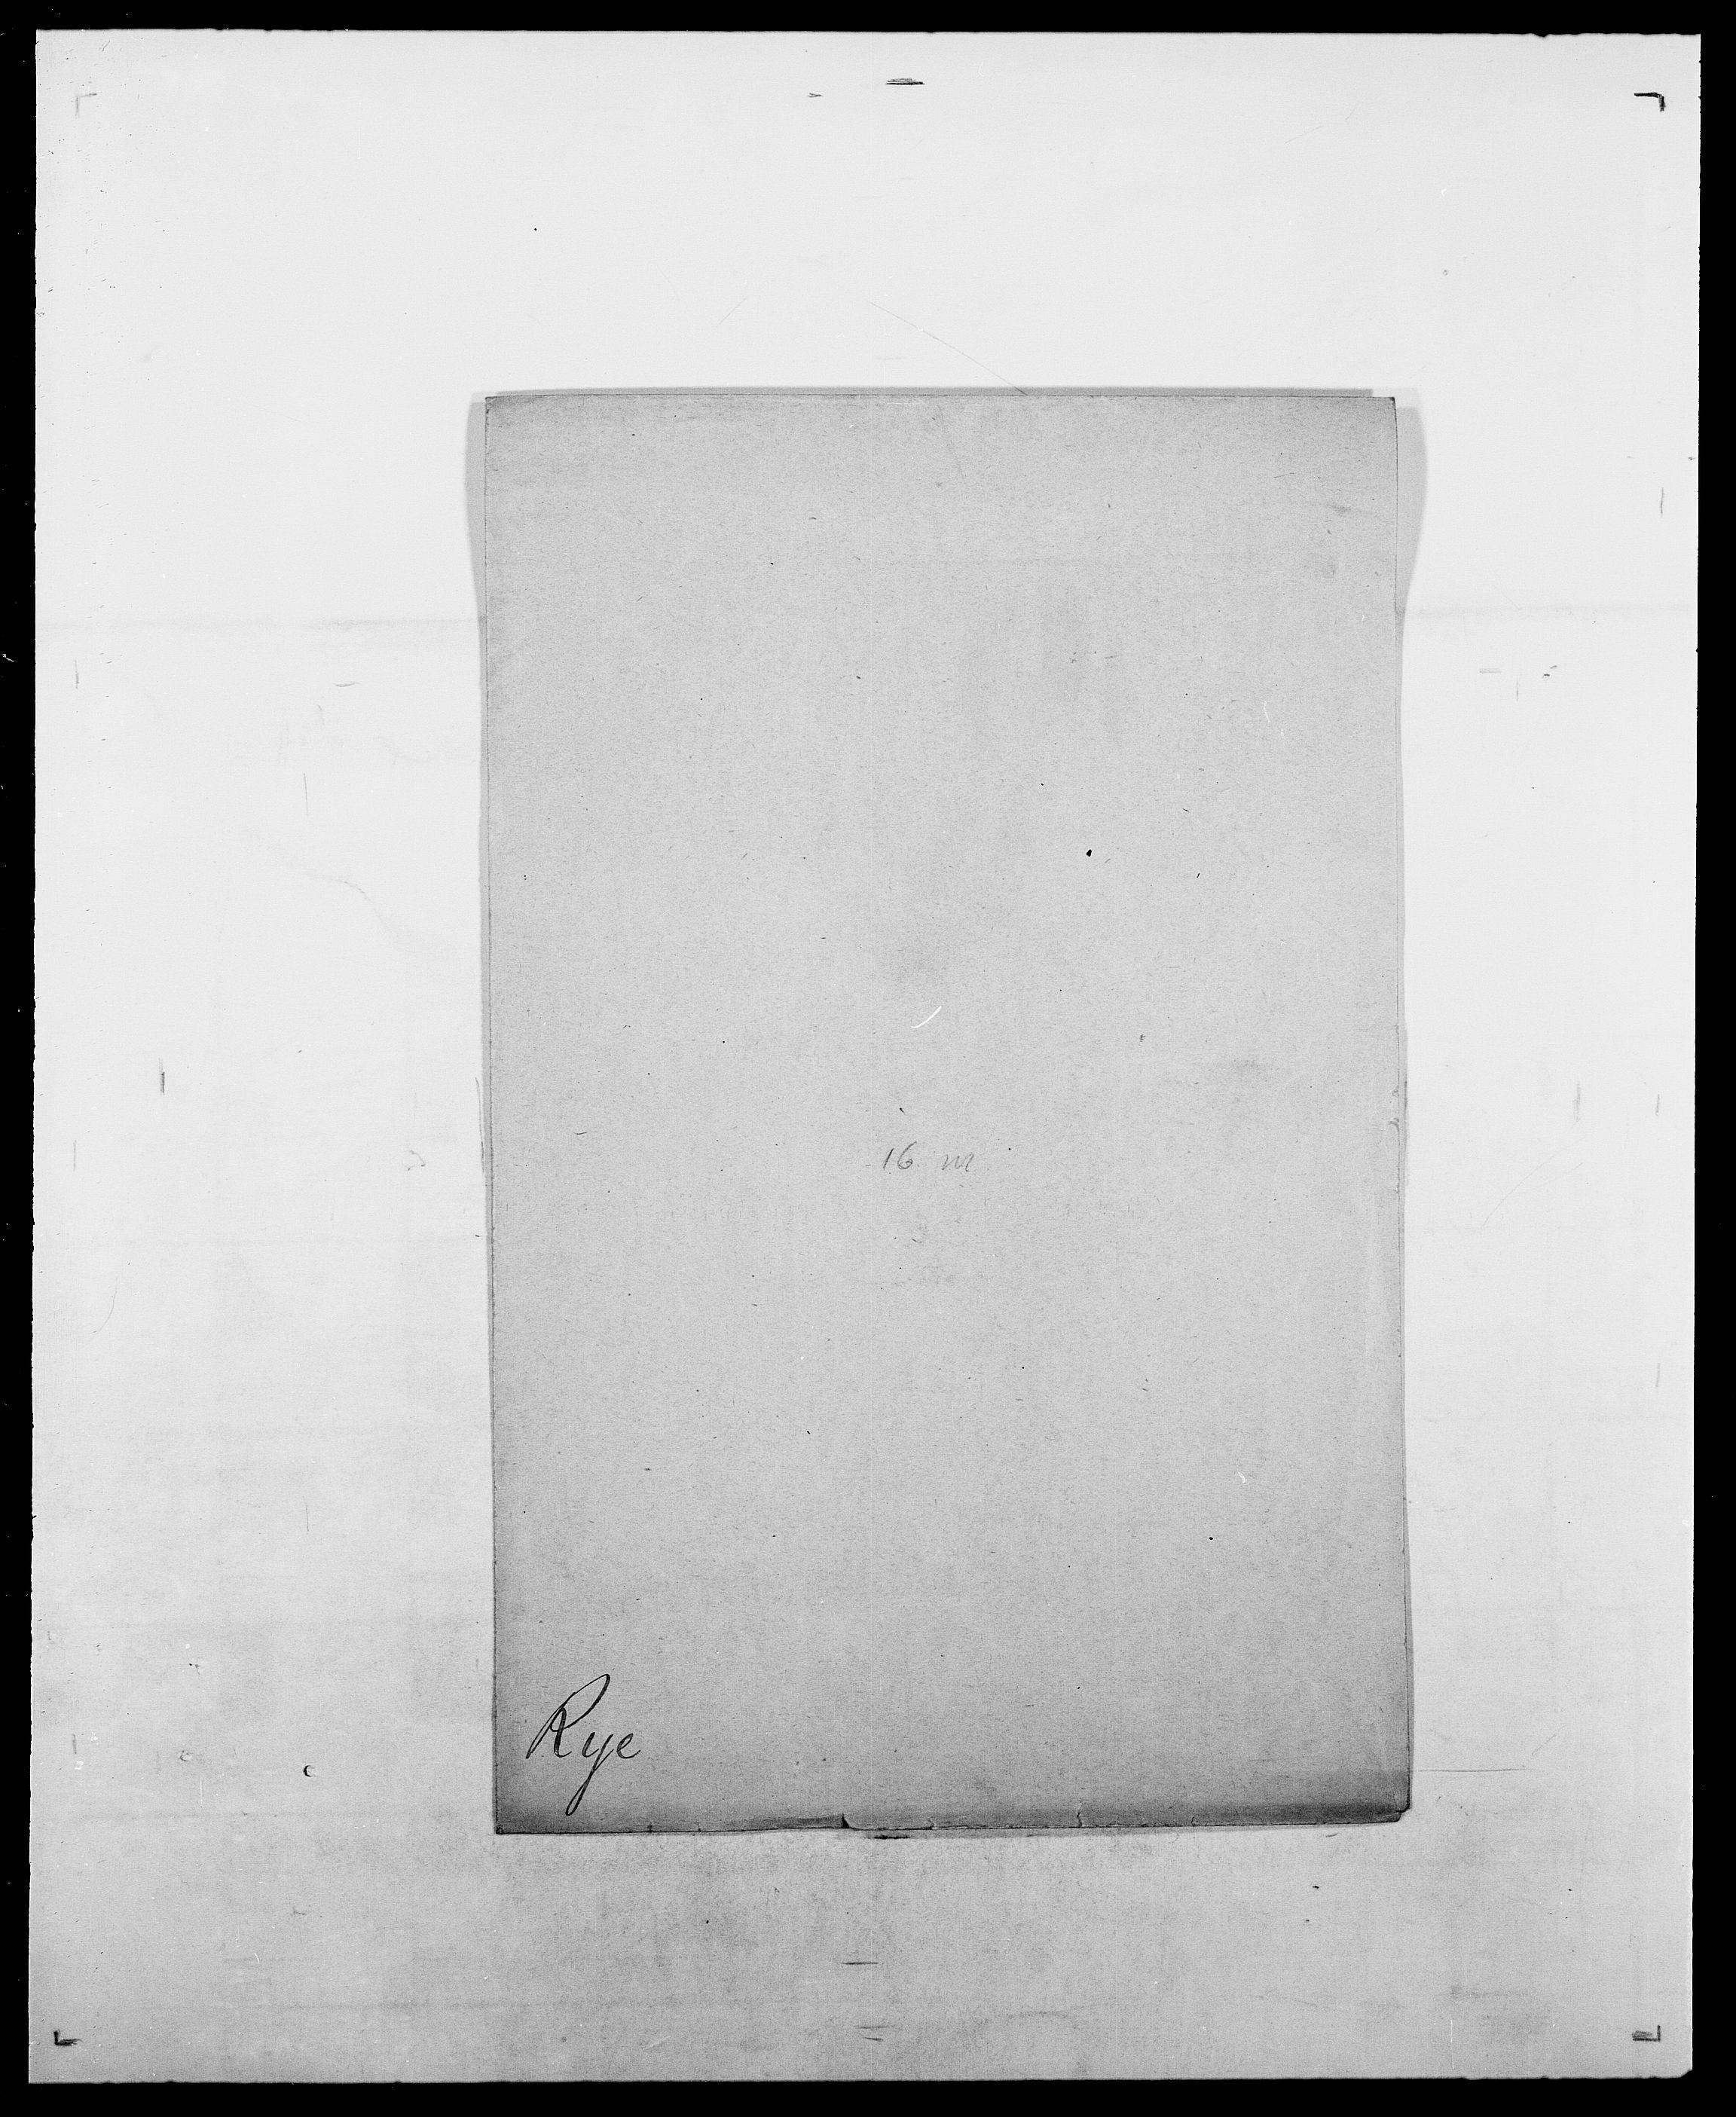 SAO, Delgobe, Charles Antoine - samling, D/Da/L0033: Roald - Røyem, s. 525